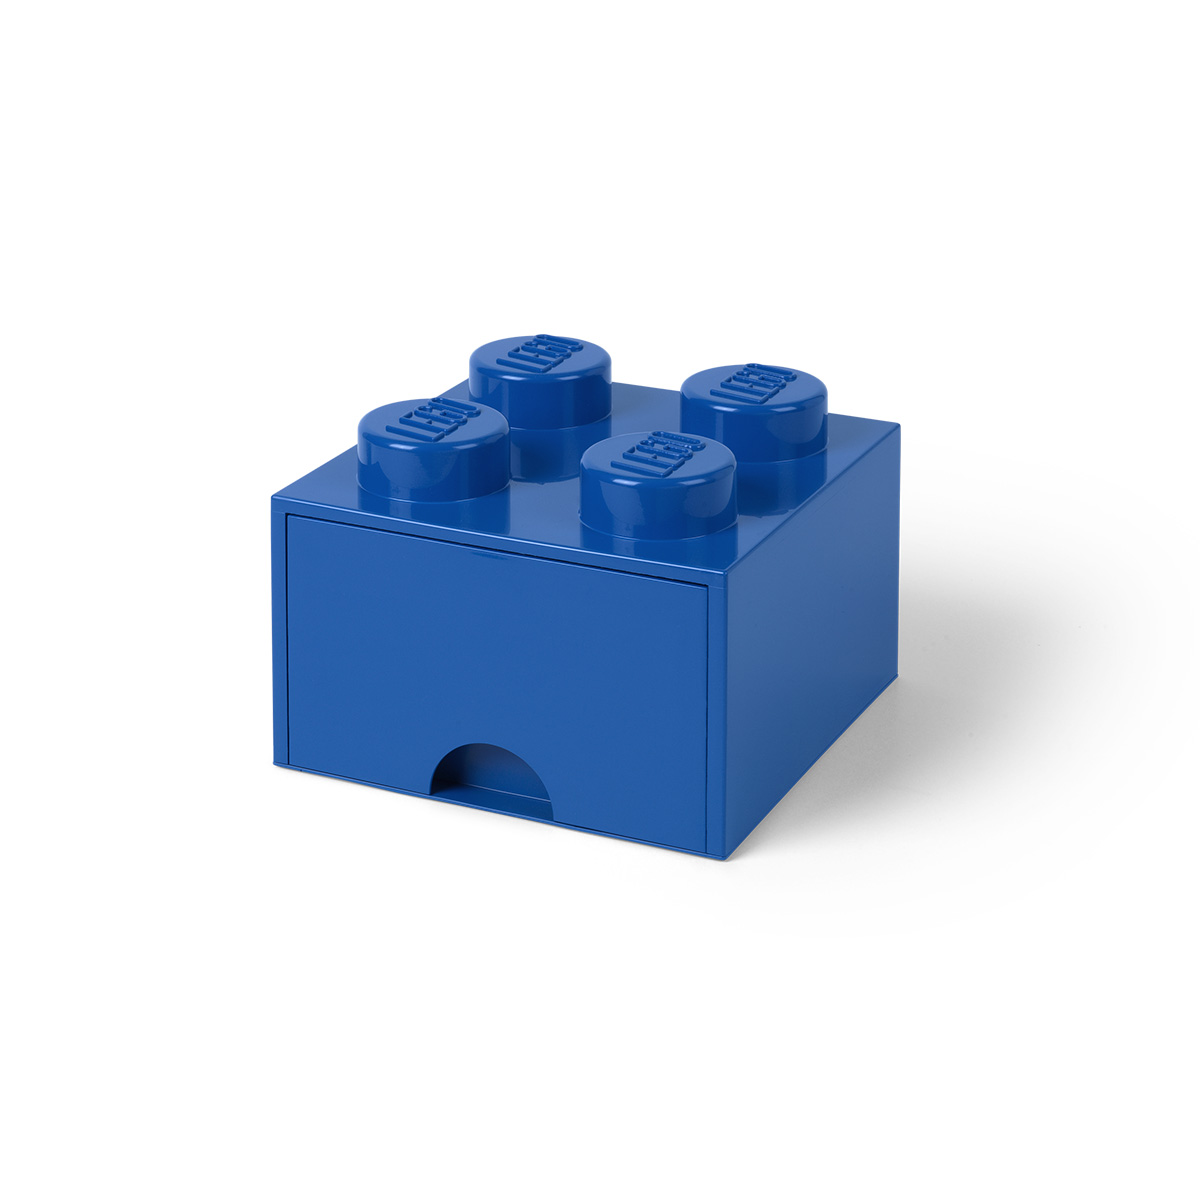 LEGO opbevaringskasse med 1 skuffe - Blå